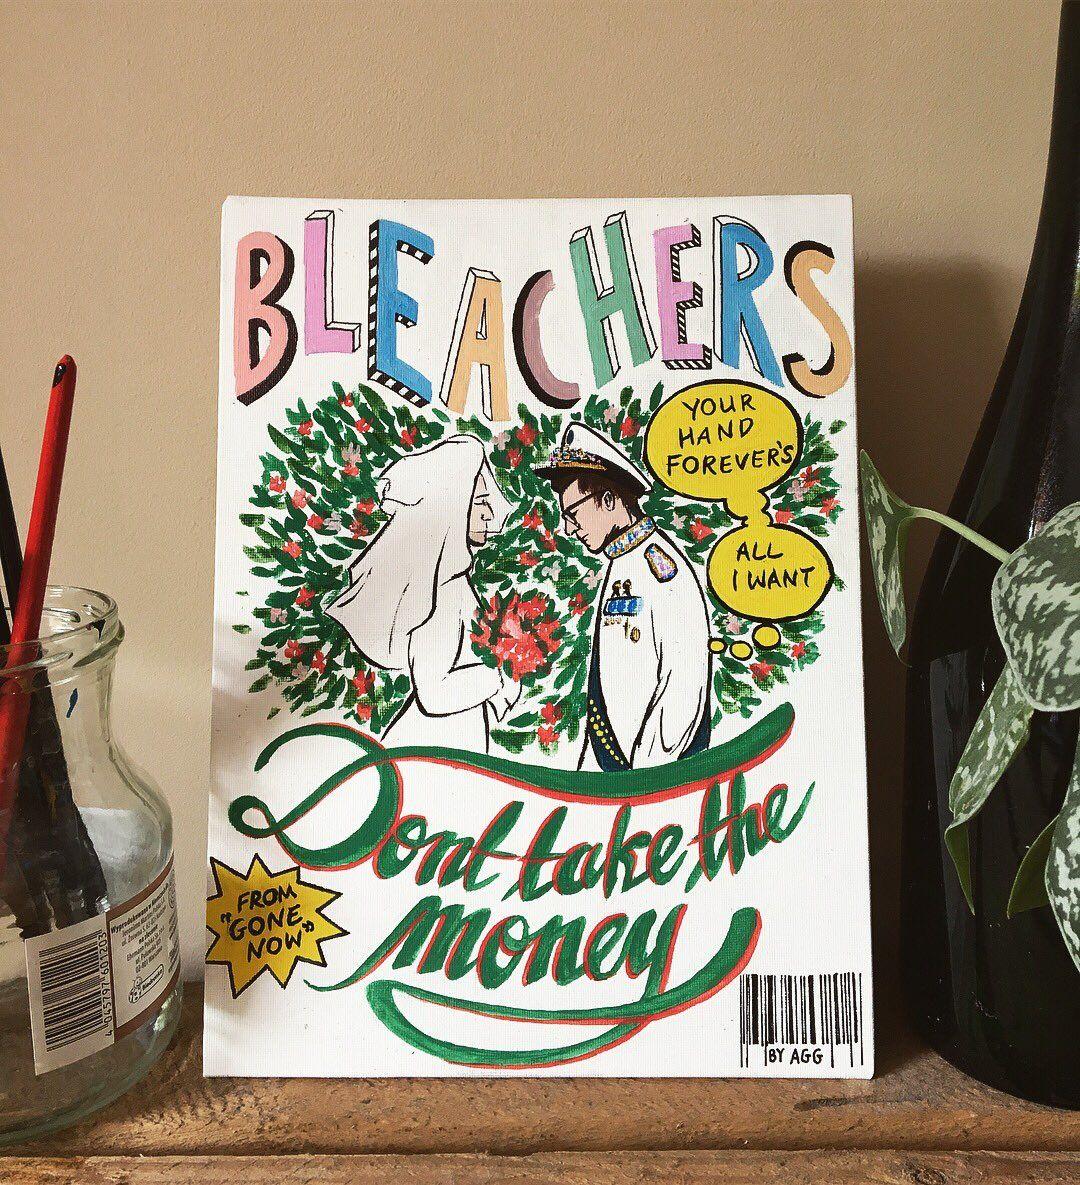 thanks @mrsxbenzedrine for the amazing bleachers comic https://t.co/a6Kz8KTla2